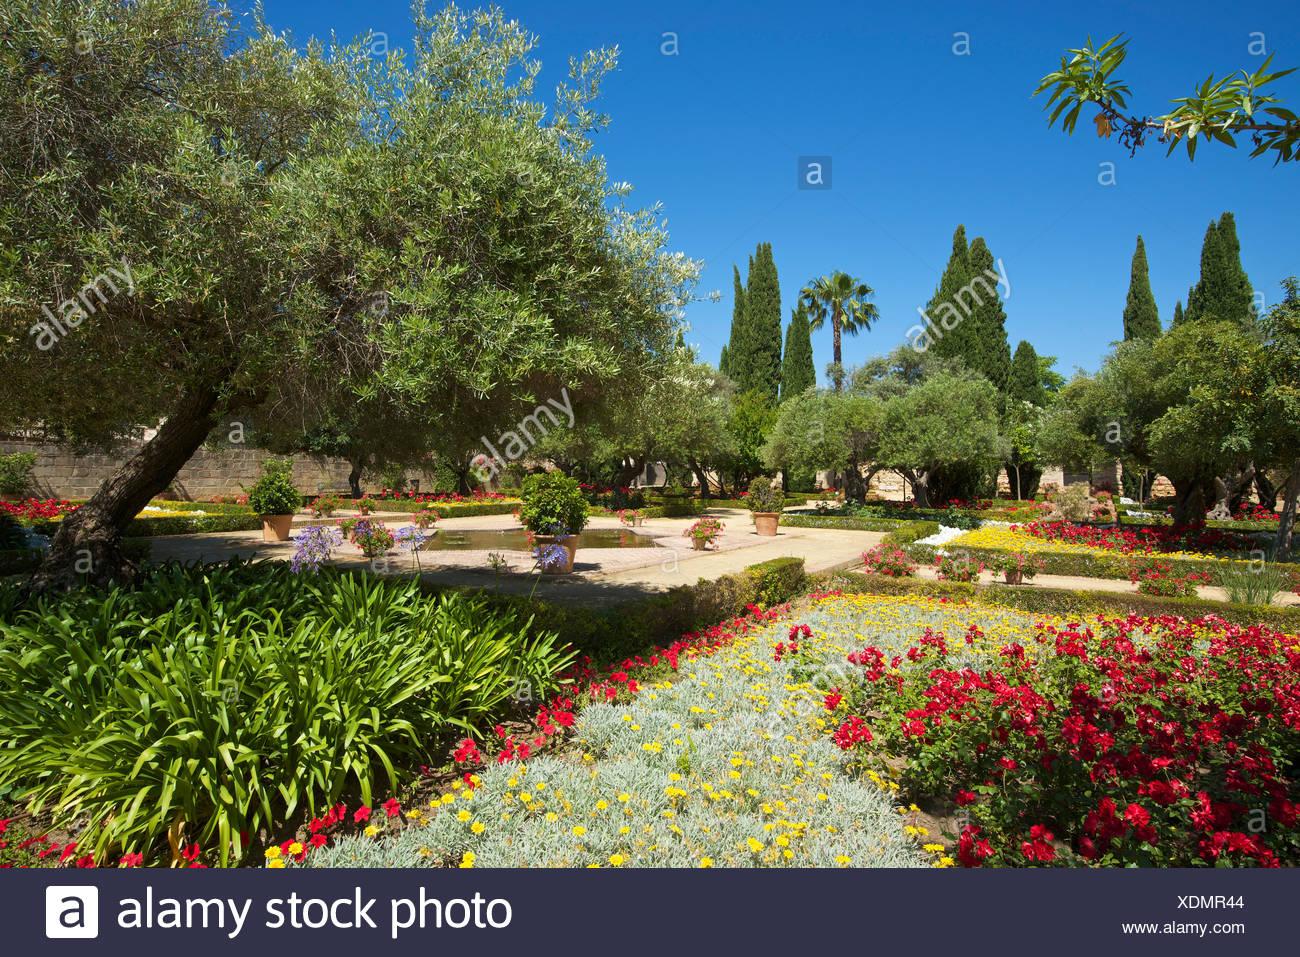 Andalusien, Spanien, Europa, draußen, Tag, Jerez De La Frontera, Costa De La Luz, niemand, Alcazar de Jerez, Garten, Gartenbau Stockbild